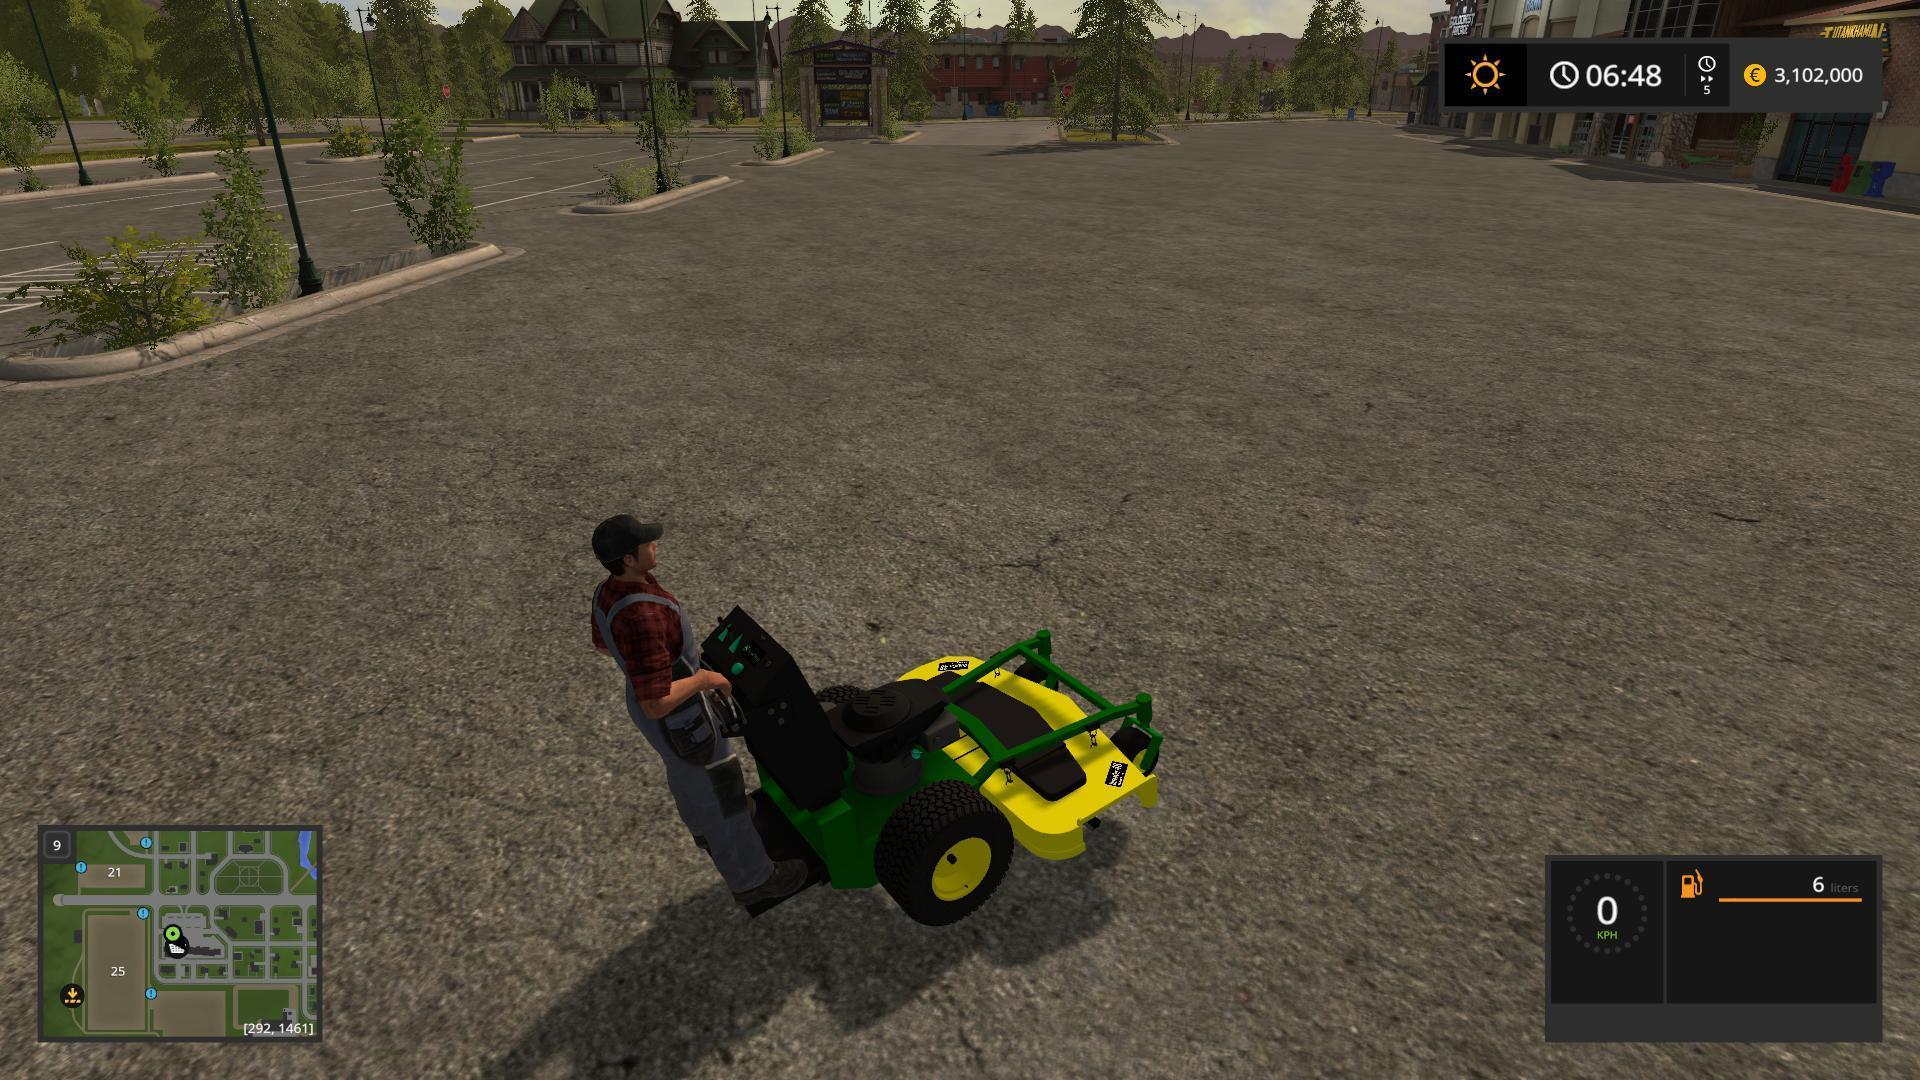 FS17 JOHN DEERE ZERO TURN CONVERTED V1 3 - Farming simulator 2019